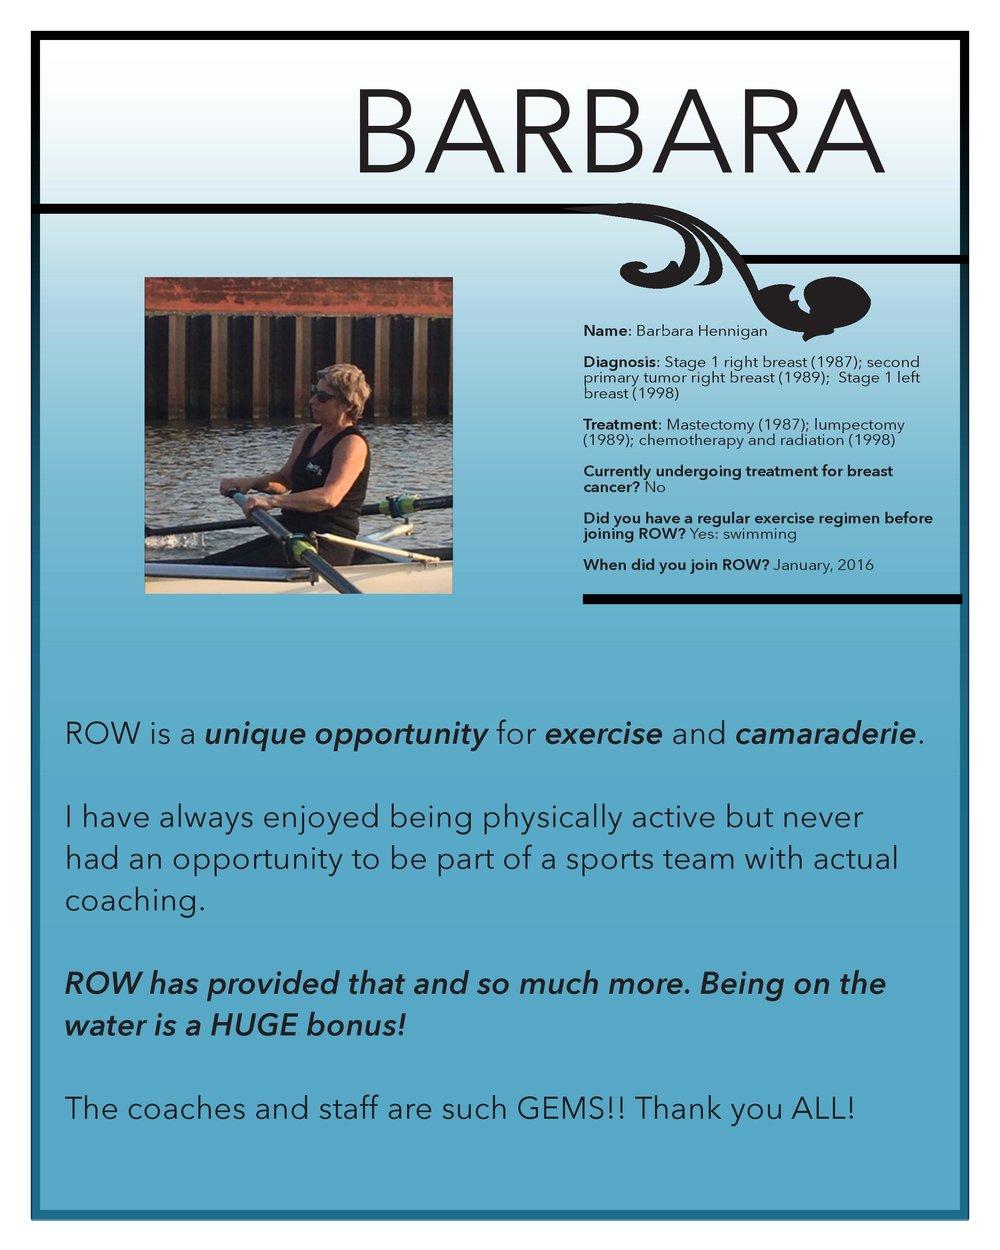 BarbaraHennigan_pROWfile (1)-page-001.jpg